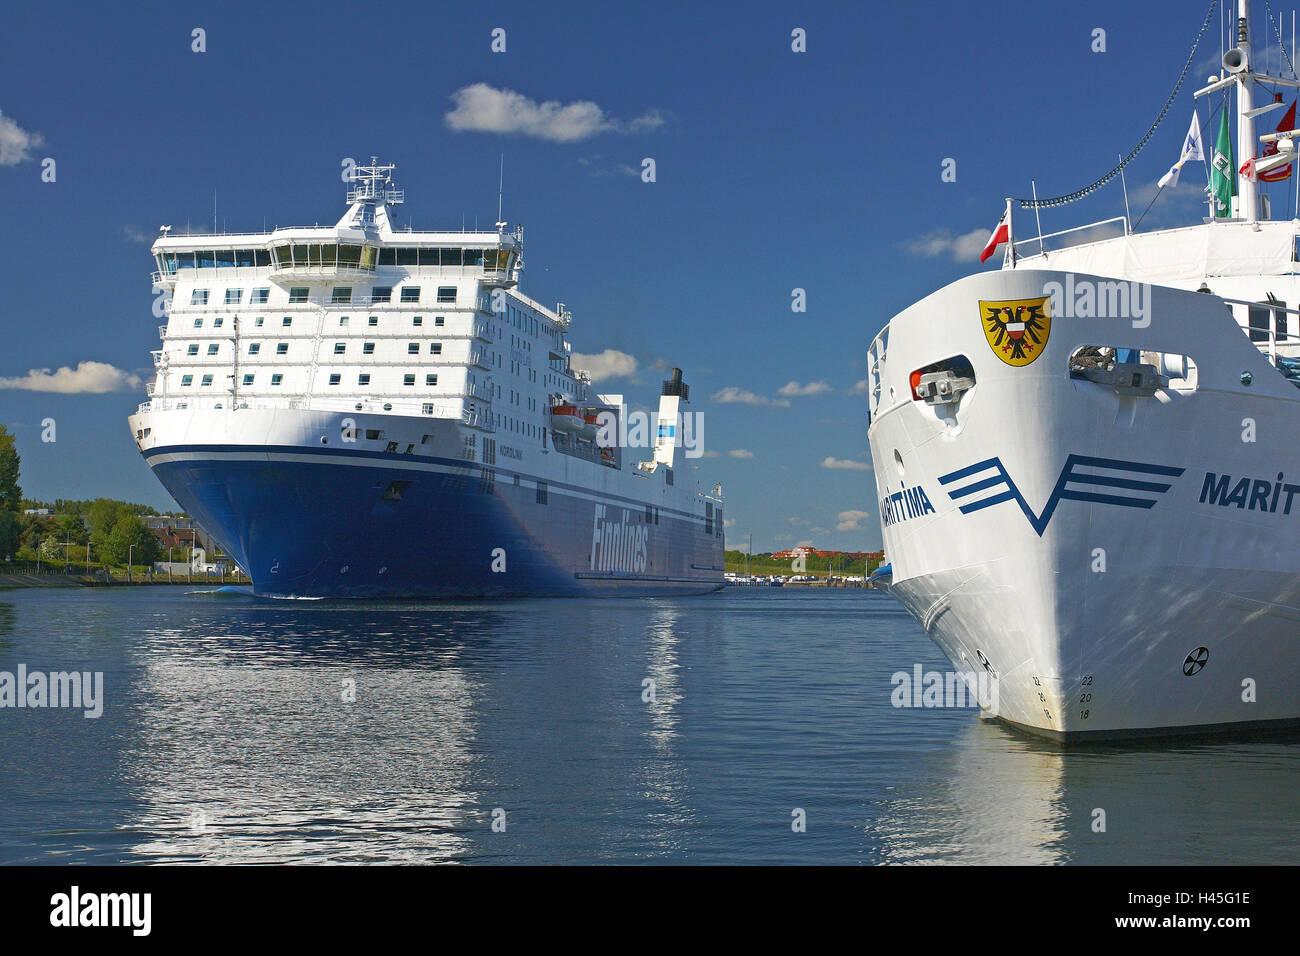 Germany, Schleswig - Holstein, Travemünde, harbour, ferry, holiday ship, - Stock Image